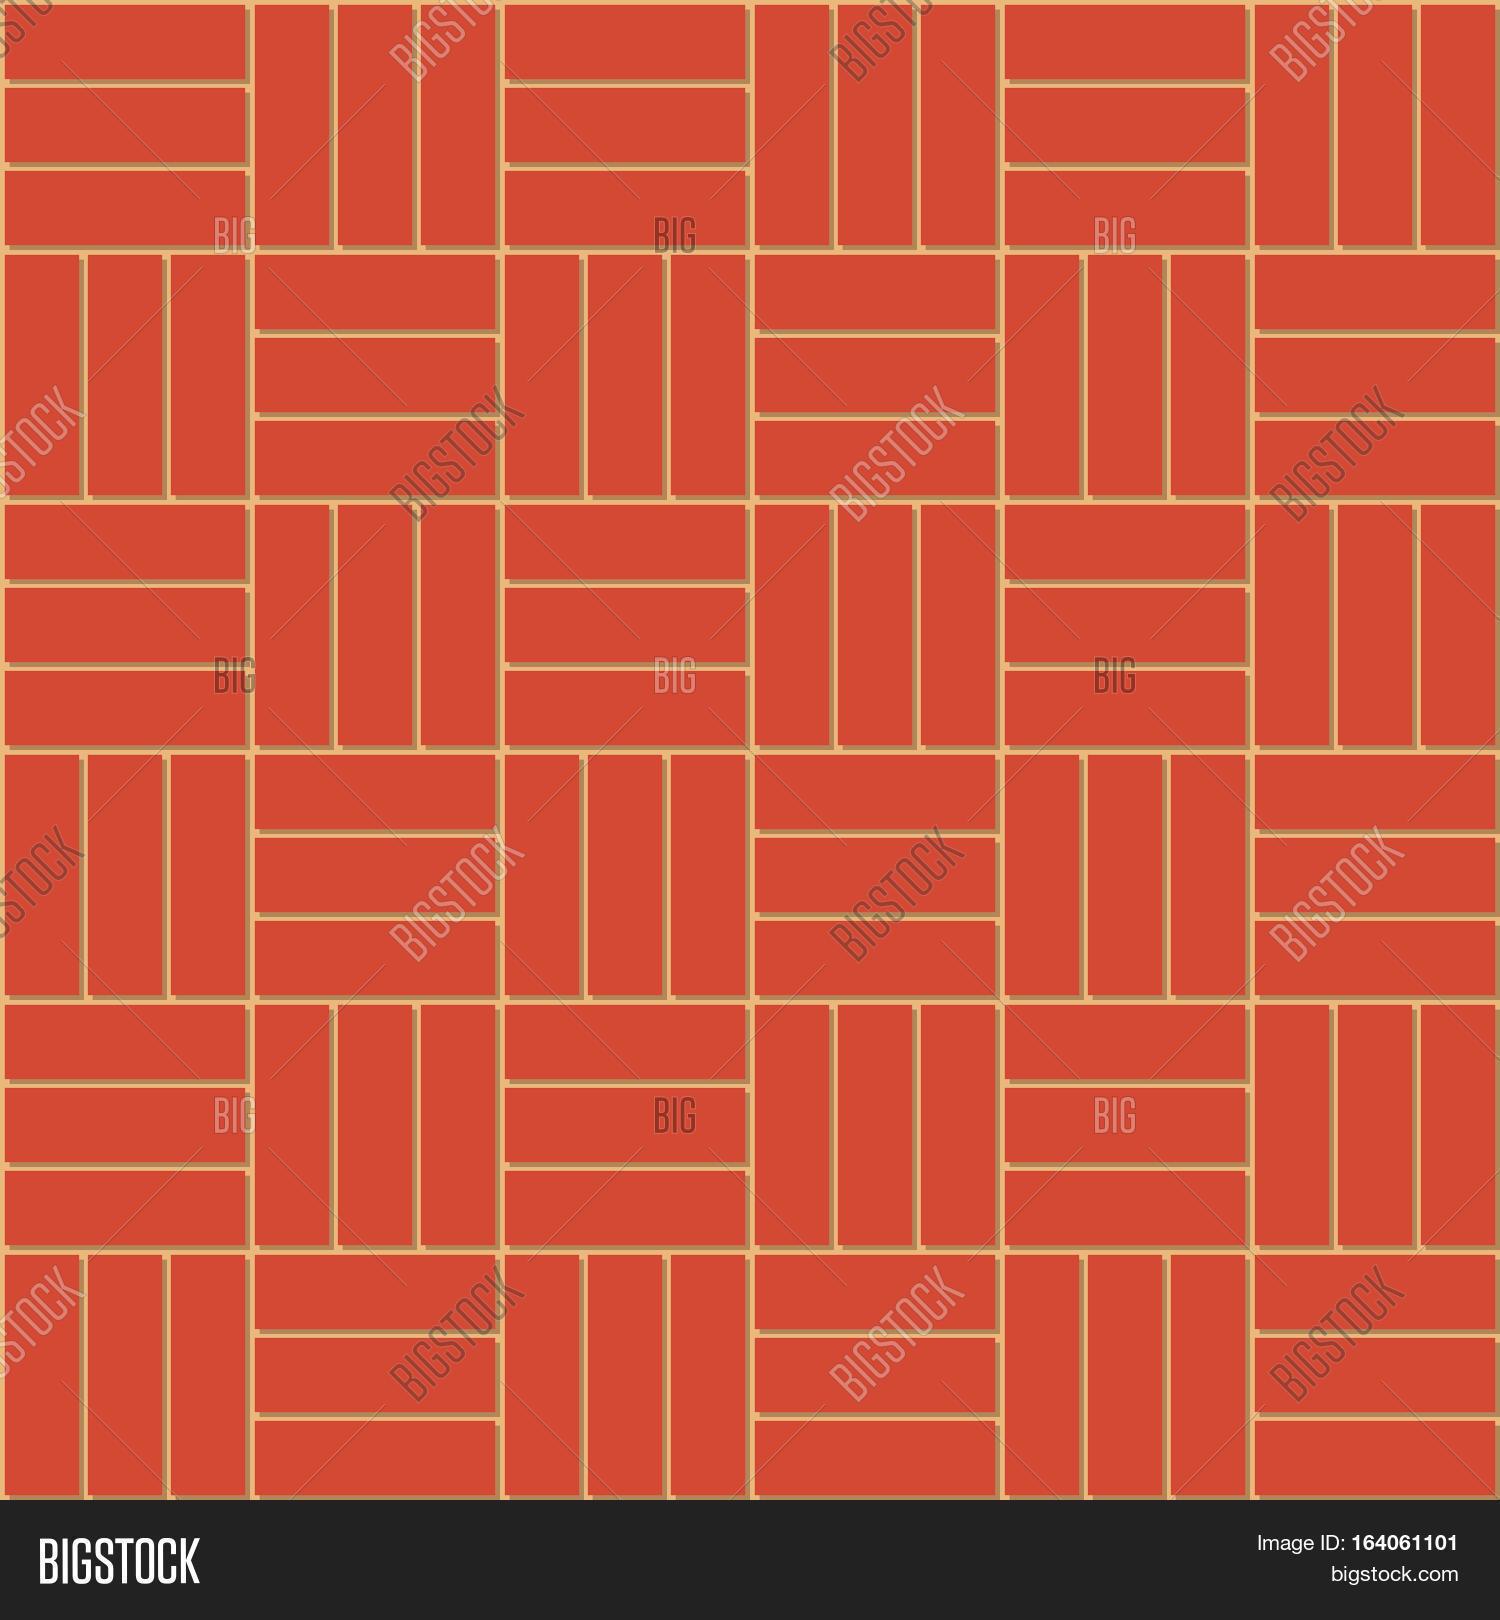 Basket weave brick pattern - Cartoon Cute Decorative Basket Weave Bond Of New Clean Red Brick Wall Vector Seamless Background